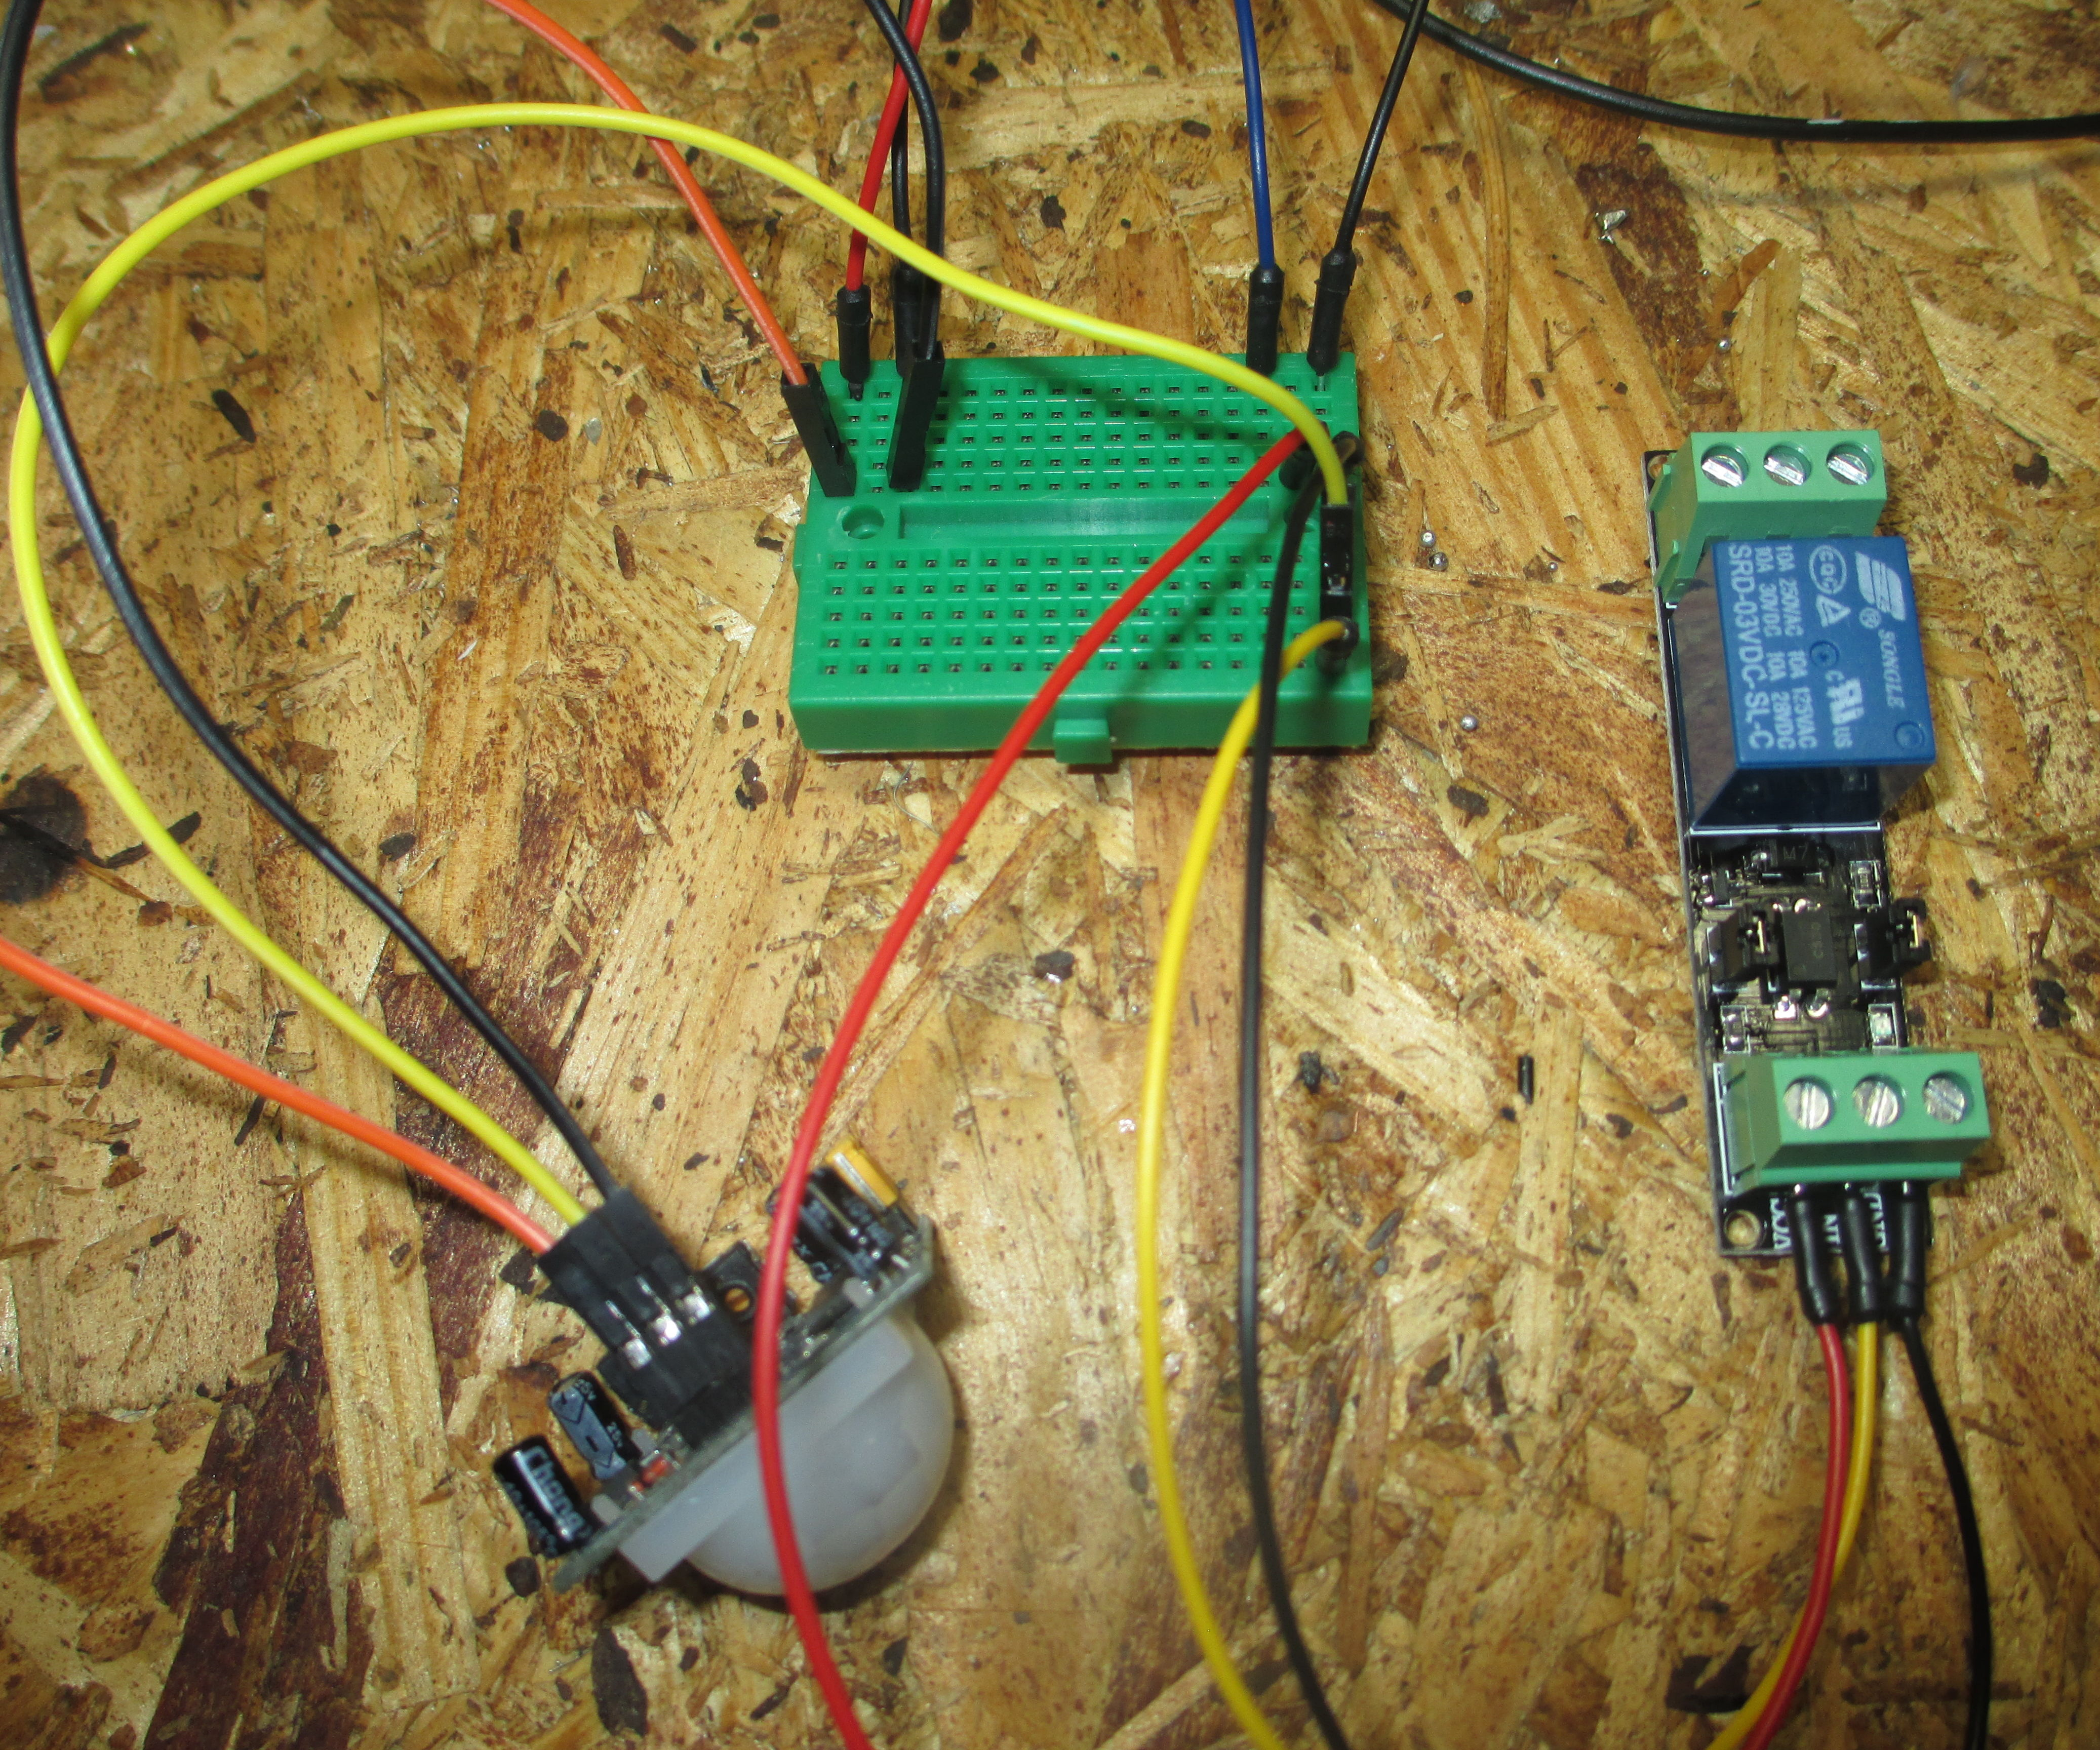 3v PIR Motion Sensor Driving  a (Defective) 3v Relay Module